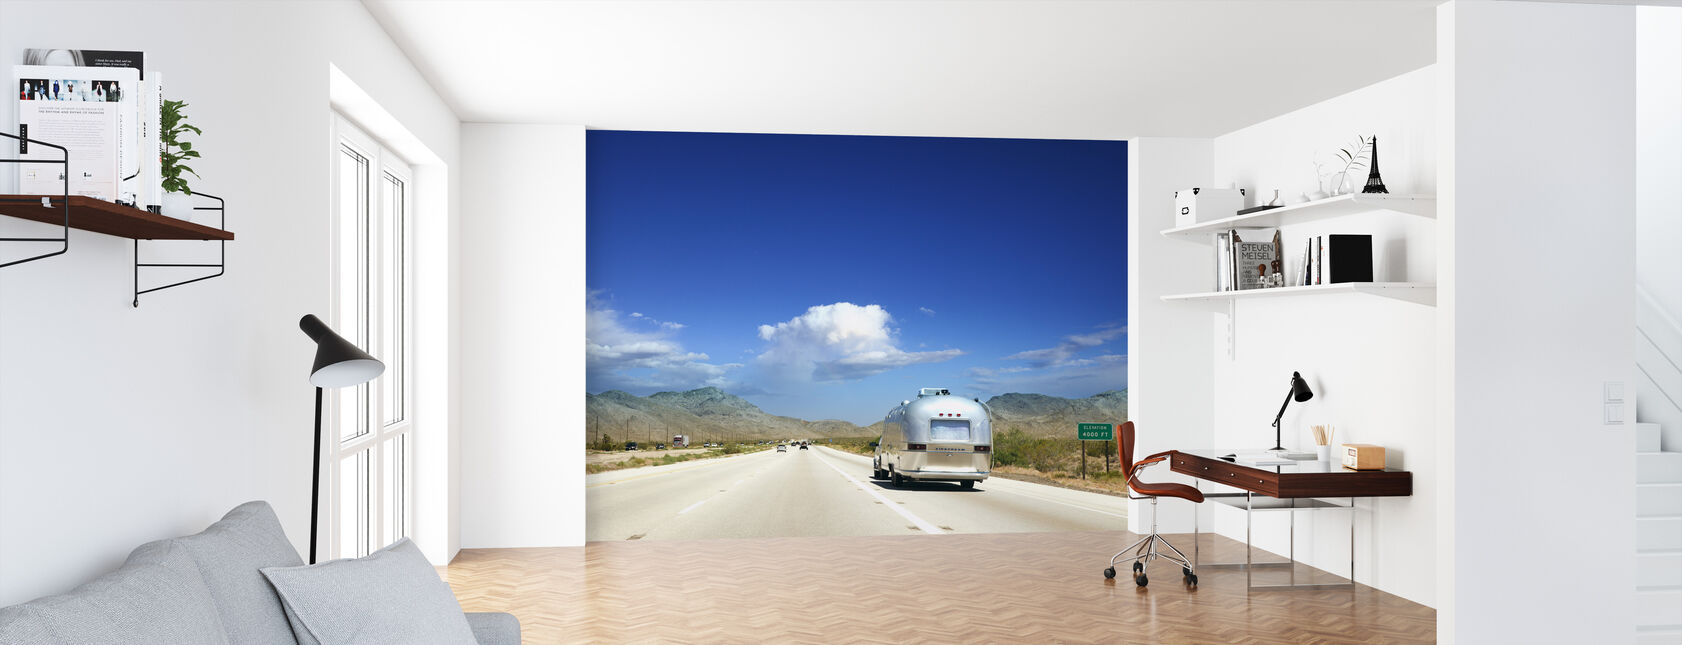 Wohnwagen in Nevada, USA - Tapete - Büro